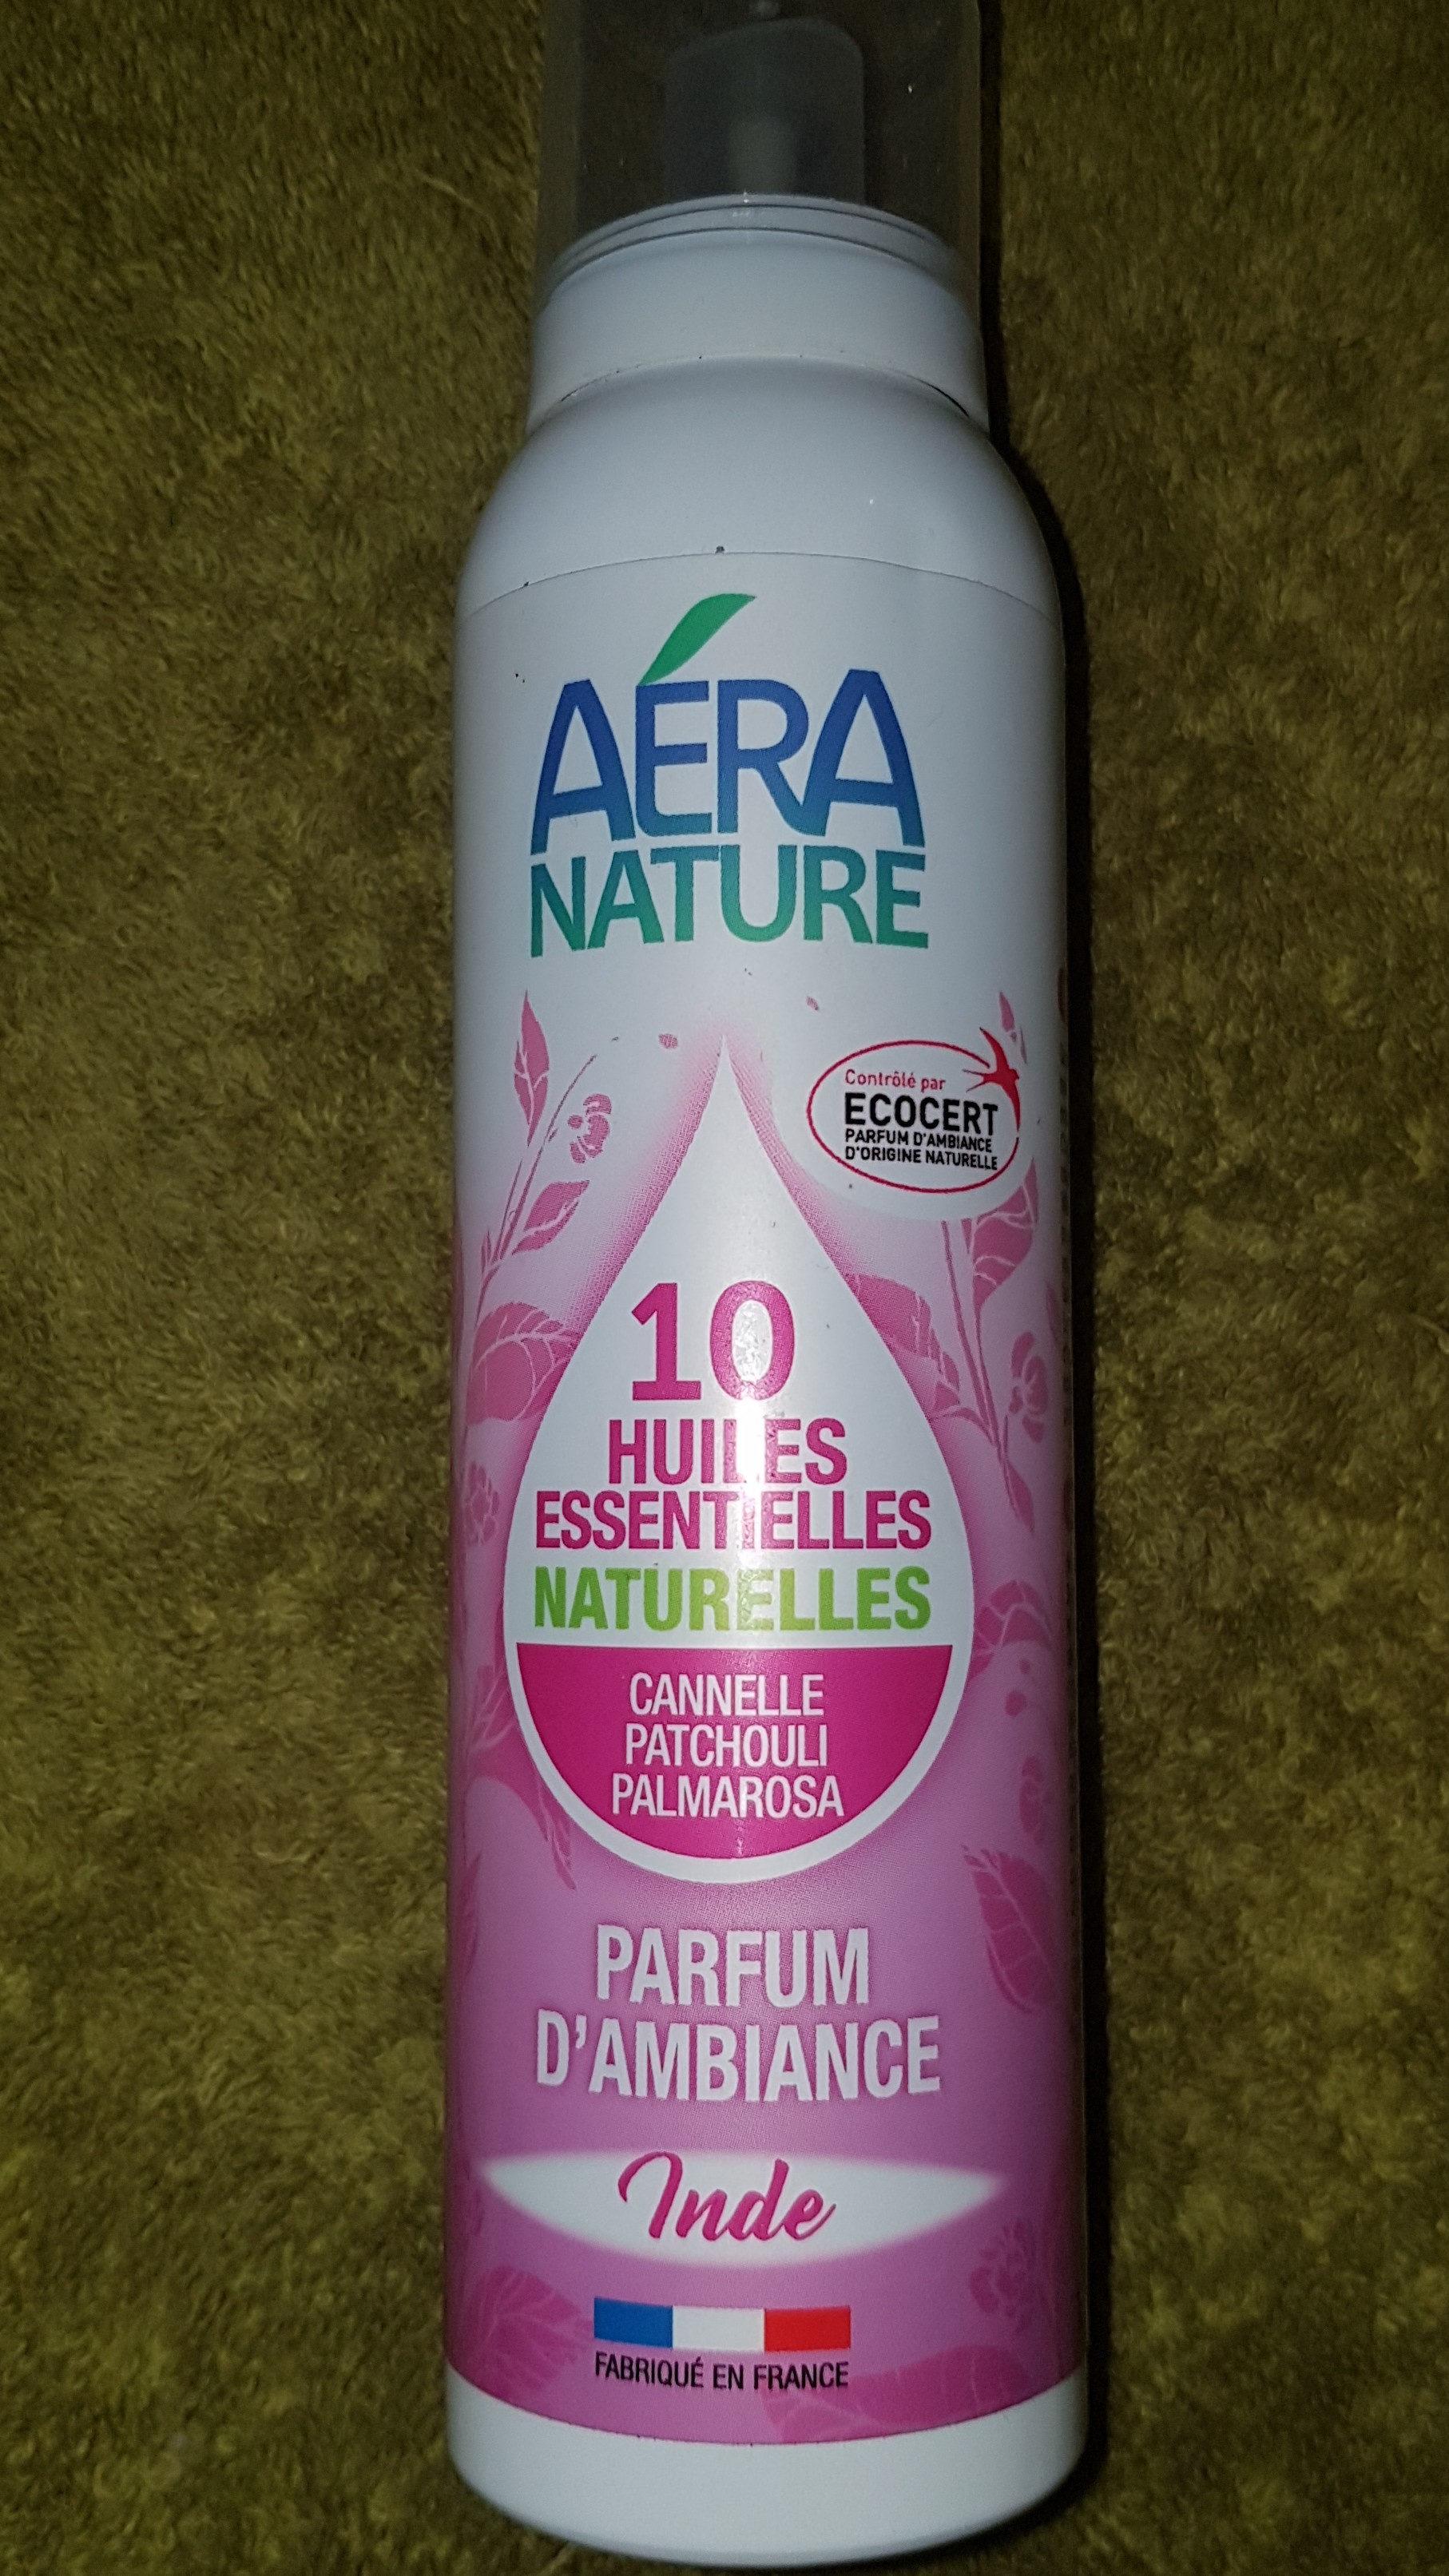 Aera Nature - Product - fr